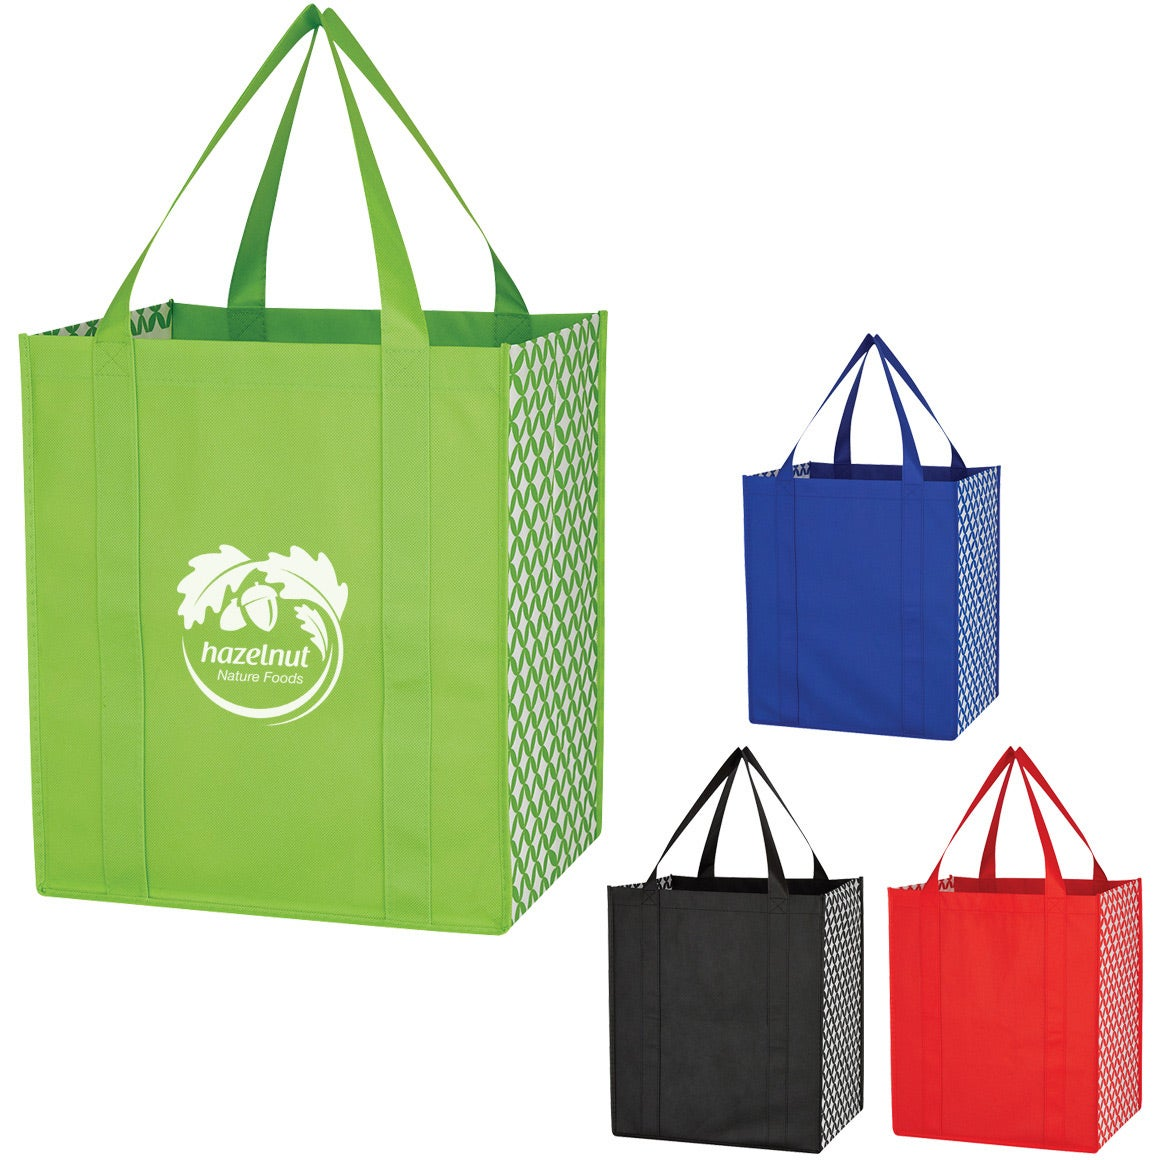 Non-Woven Frequent Shopper Tote Bag